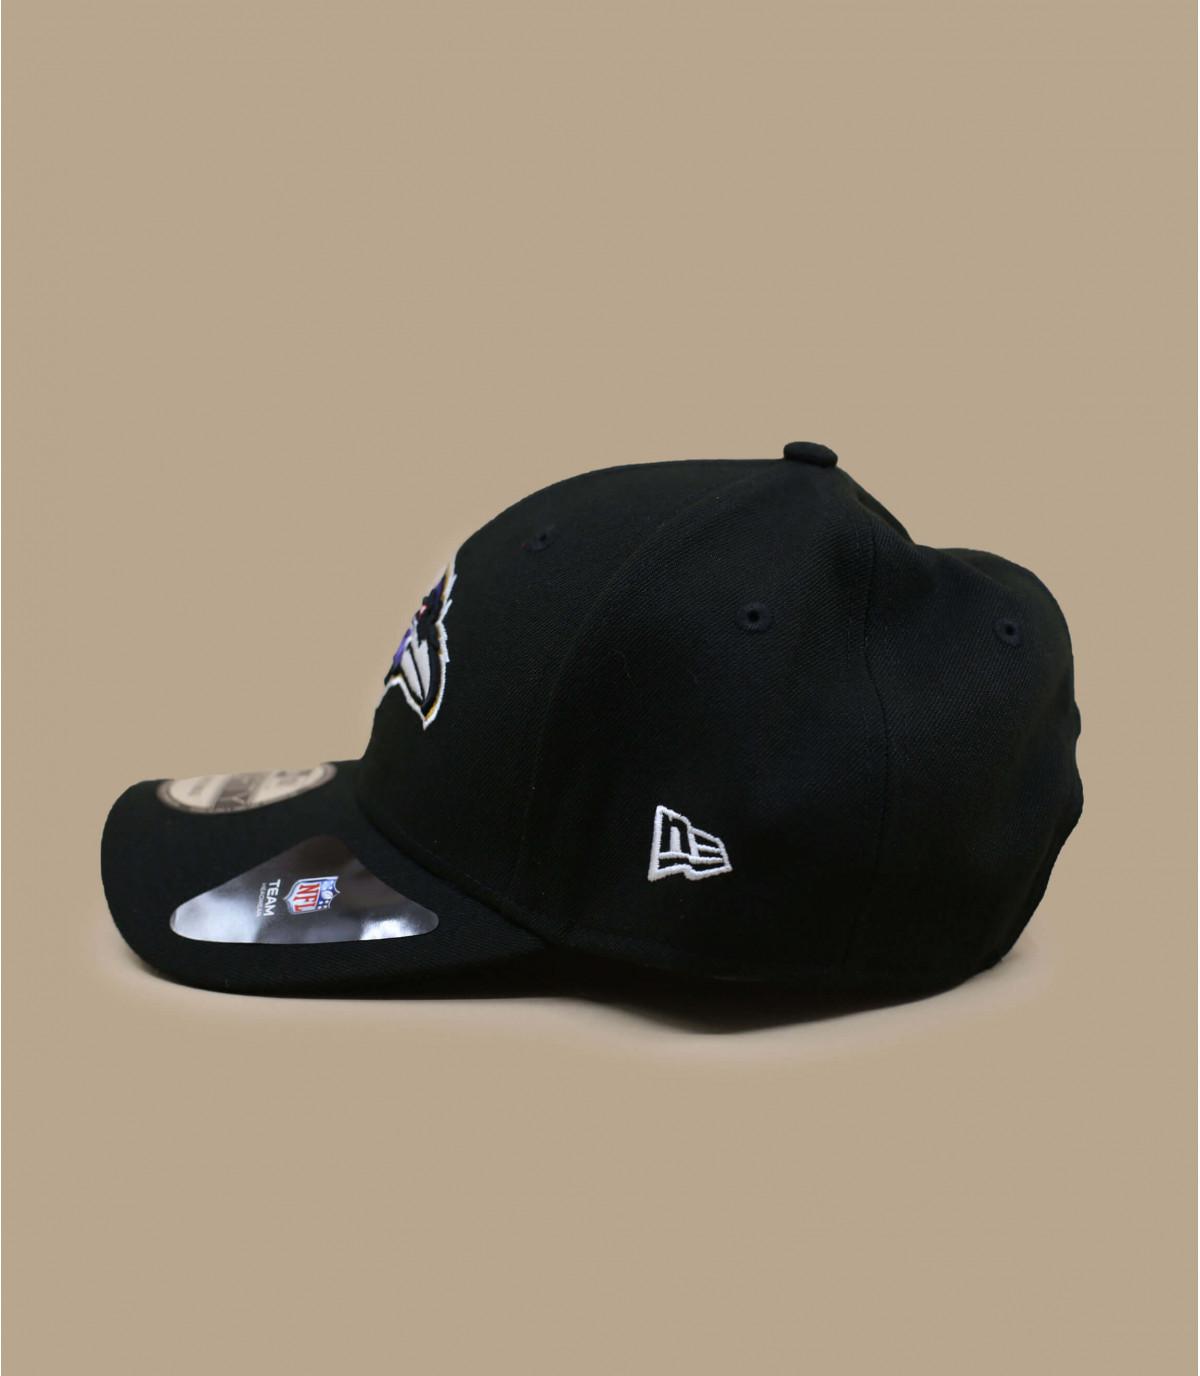 Ravens curva Cap Black